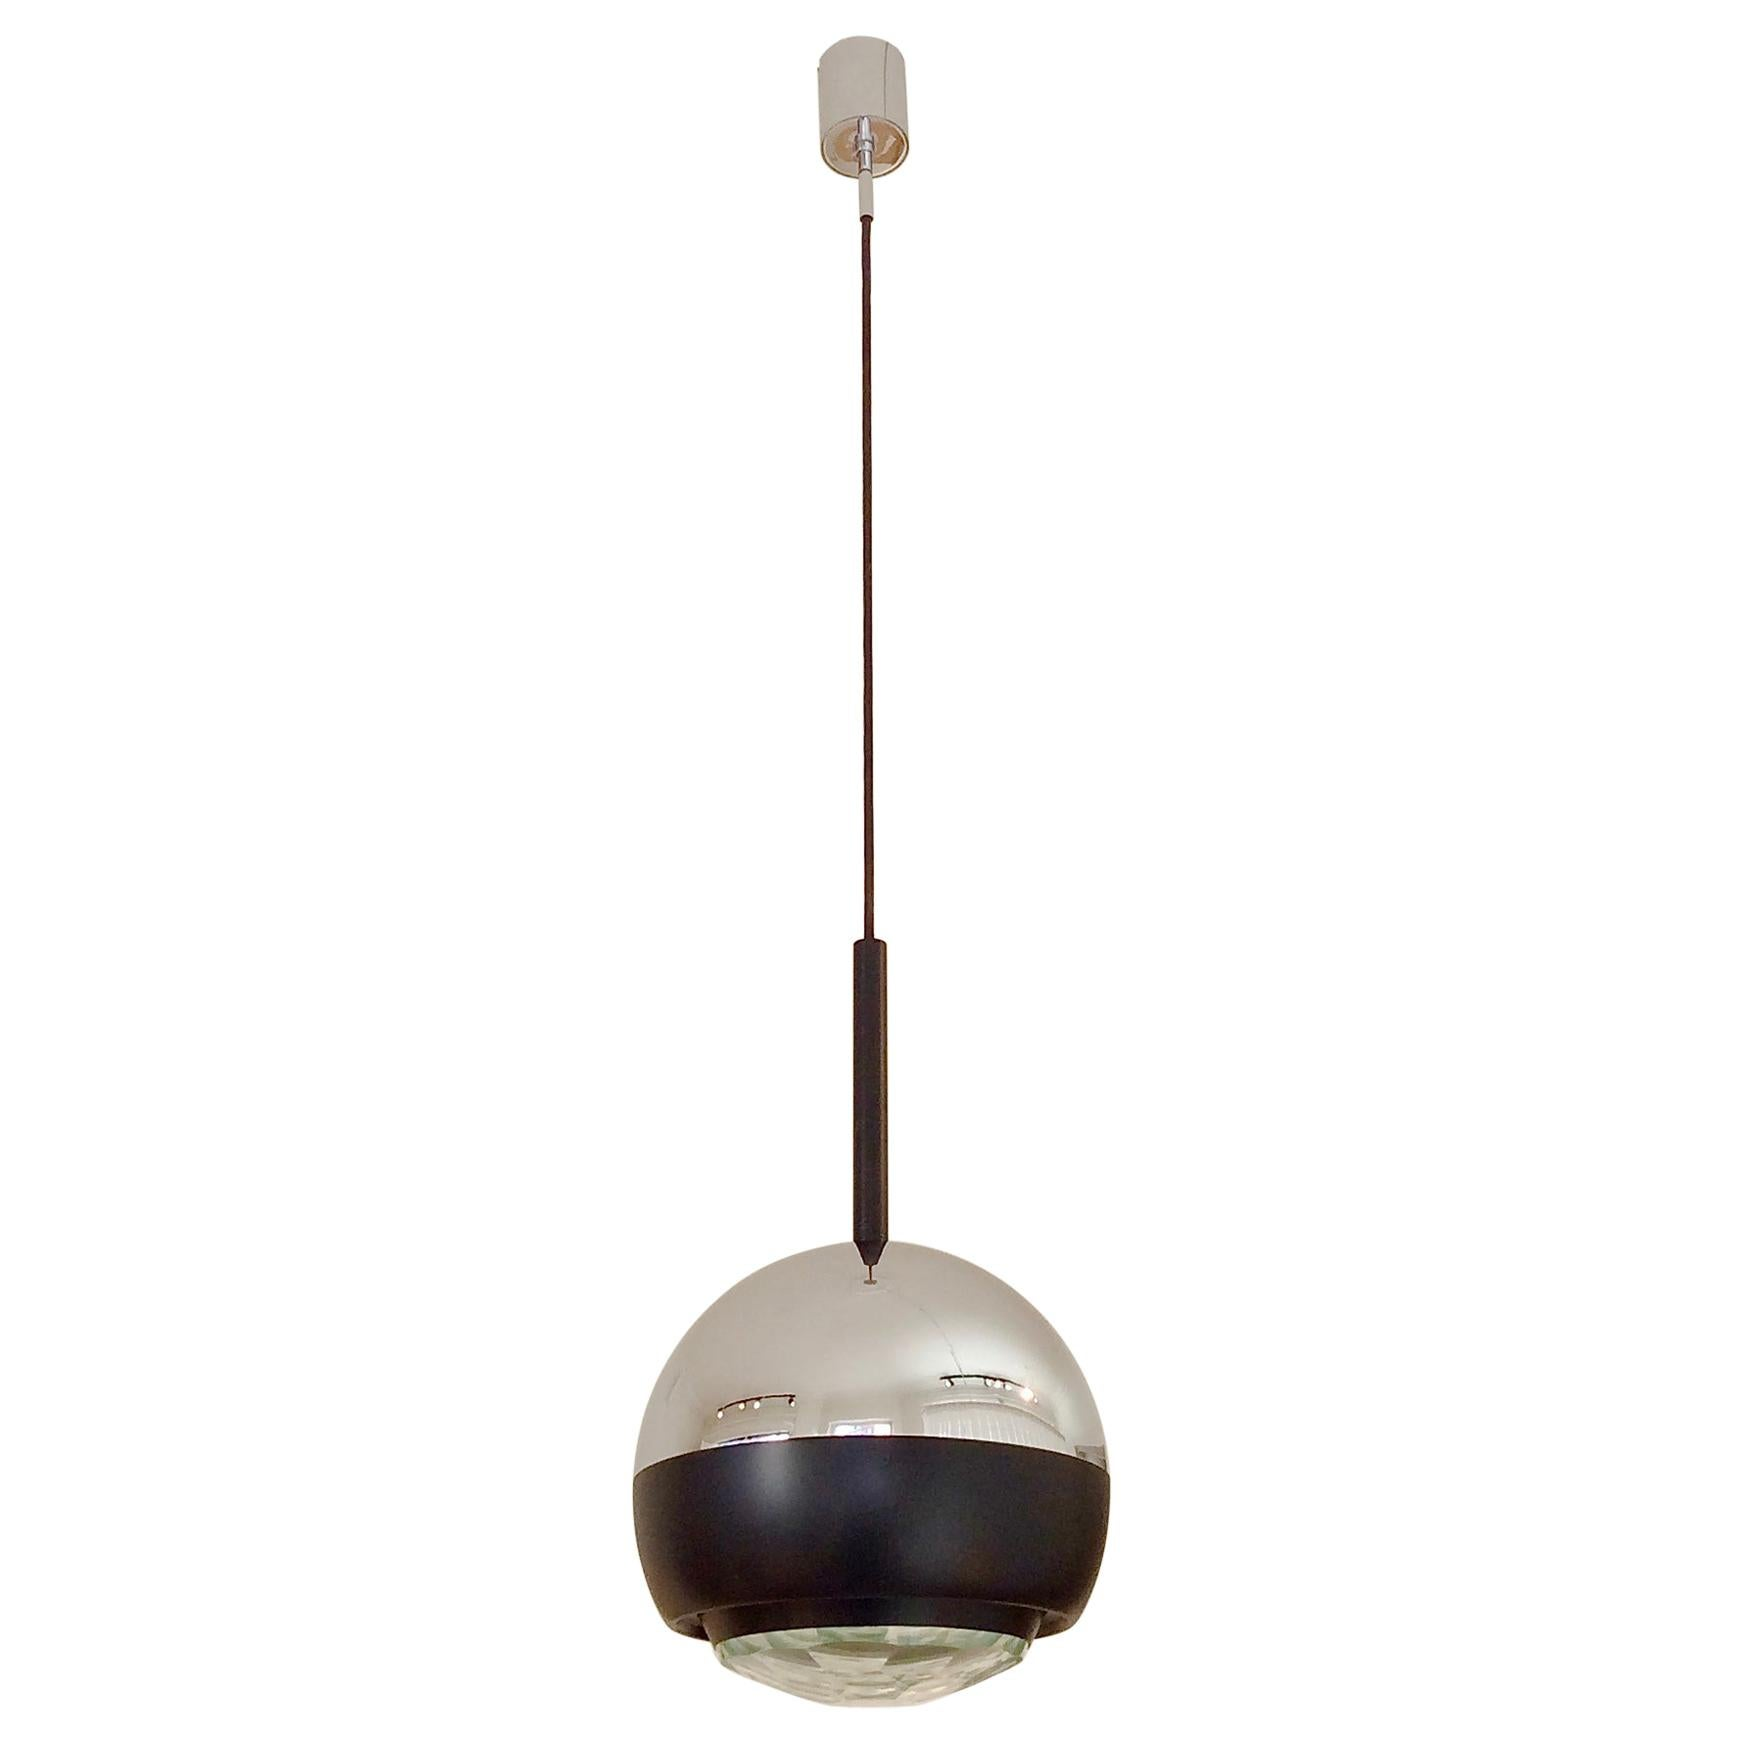 Stilnovo Glass and Metal Pendant Lamp Mod.1230, circa 1960, Italy